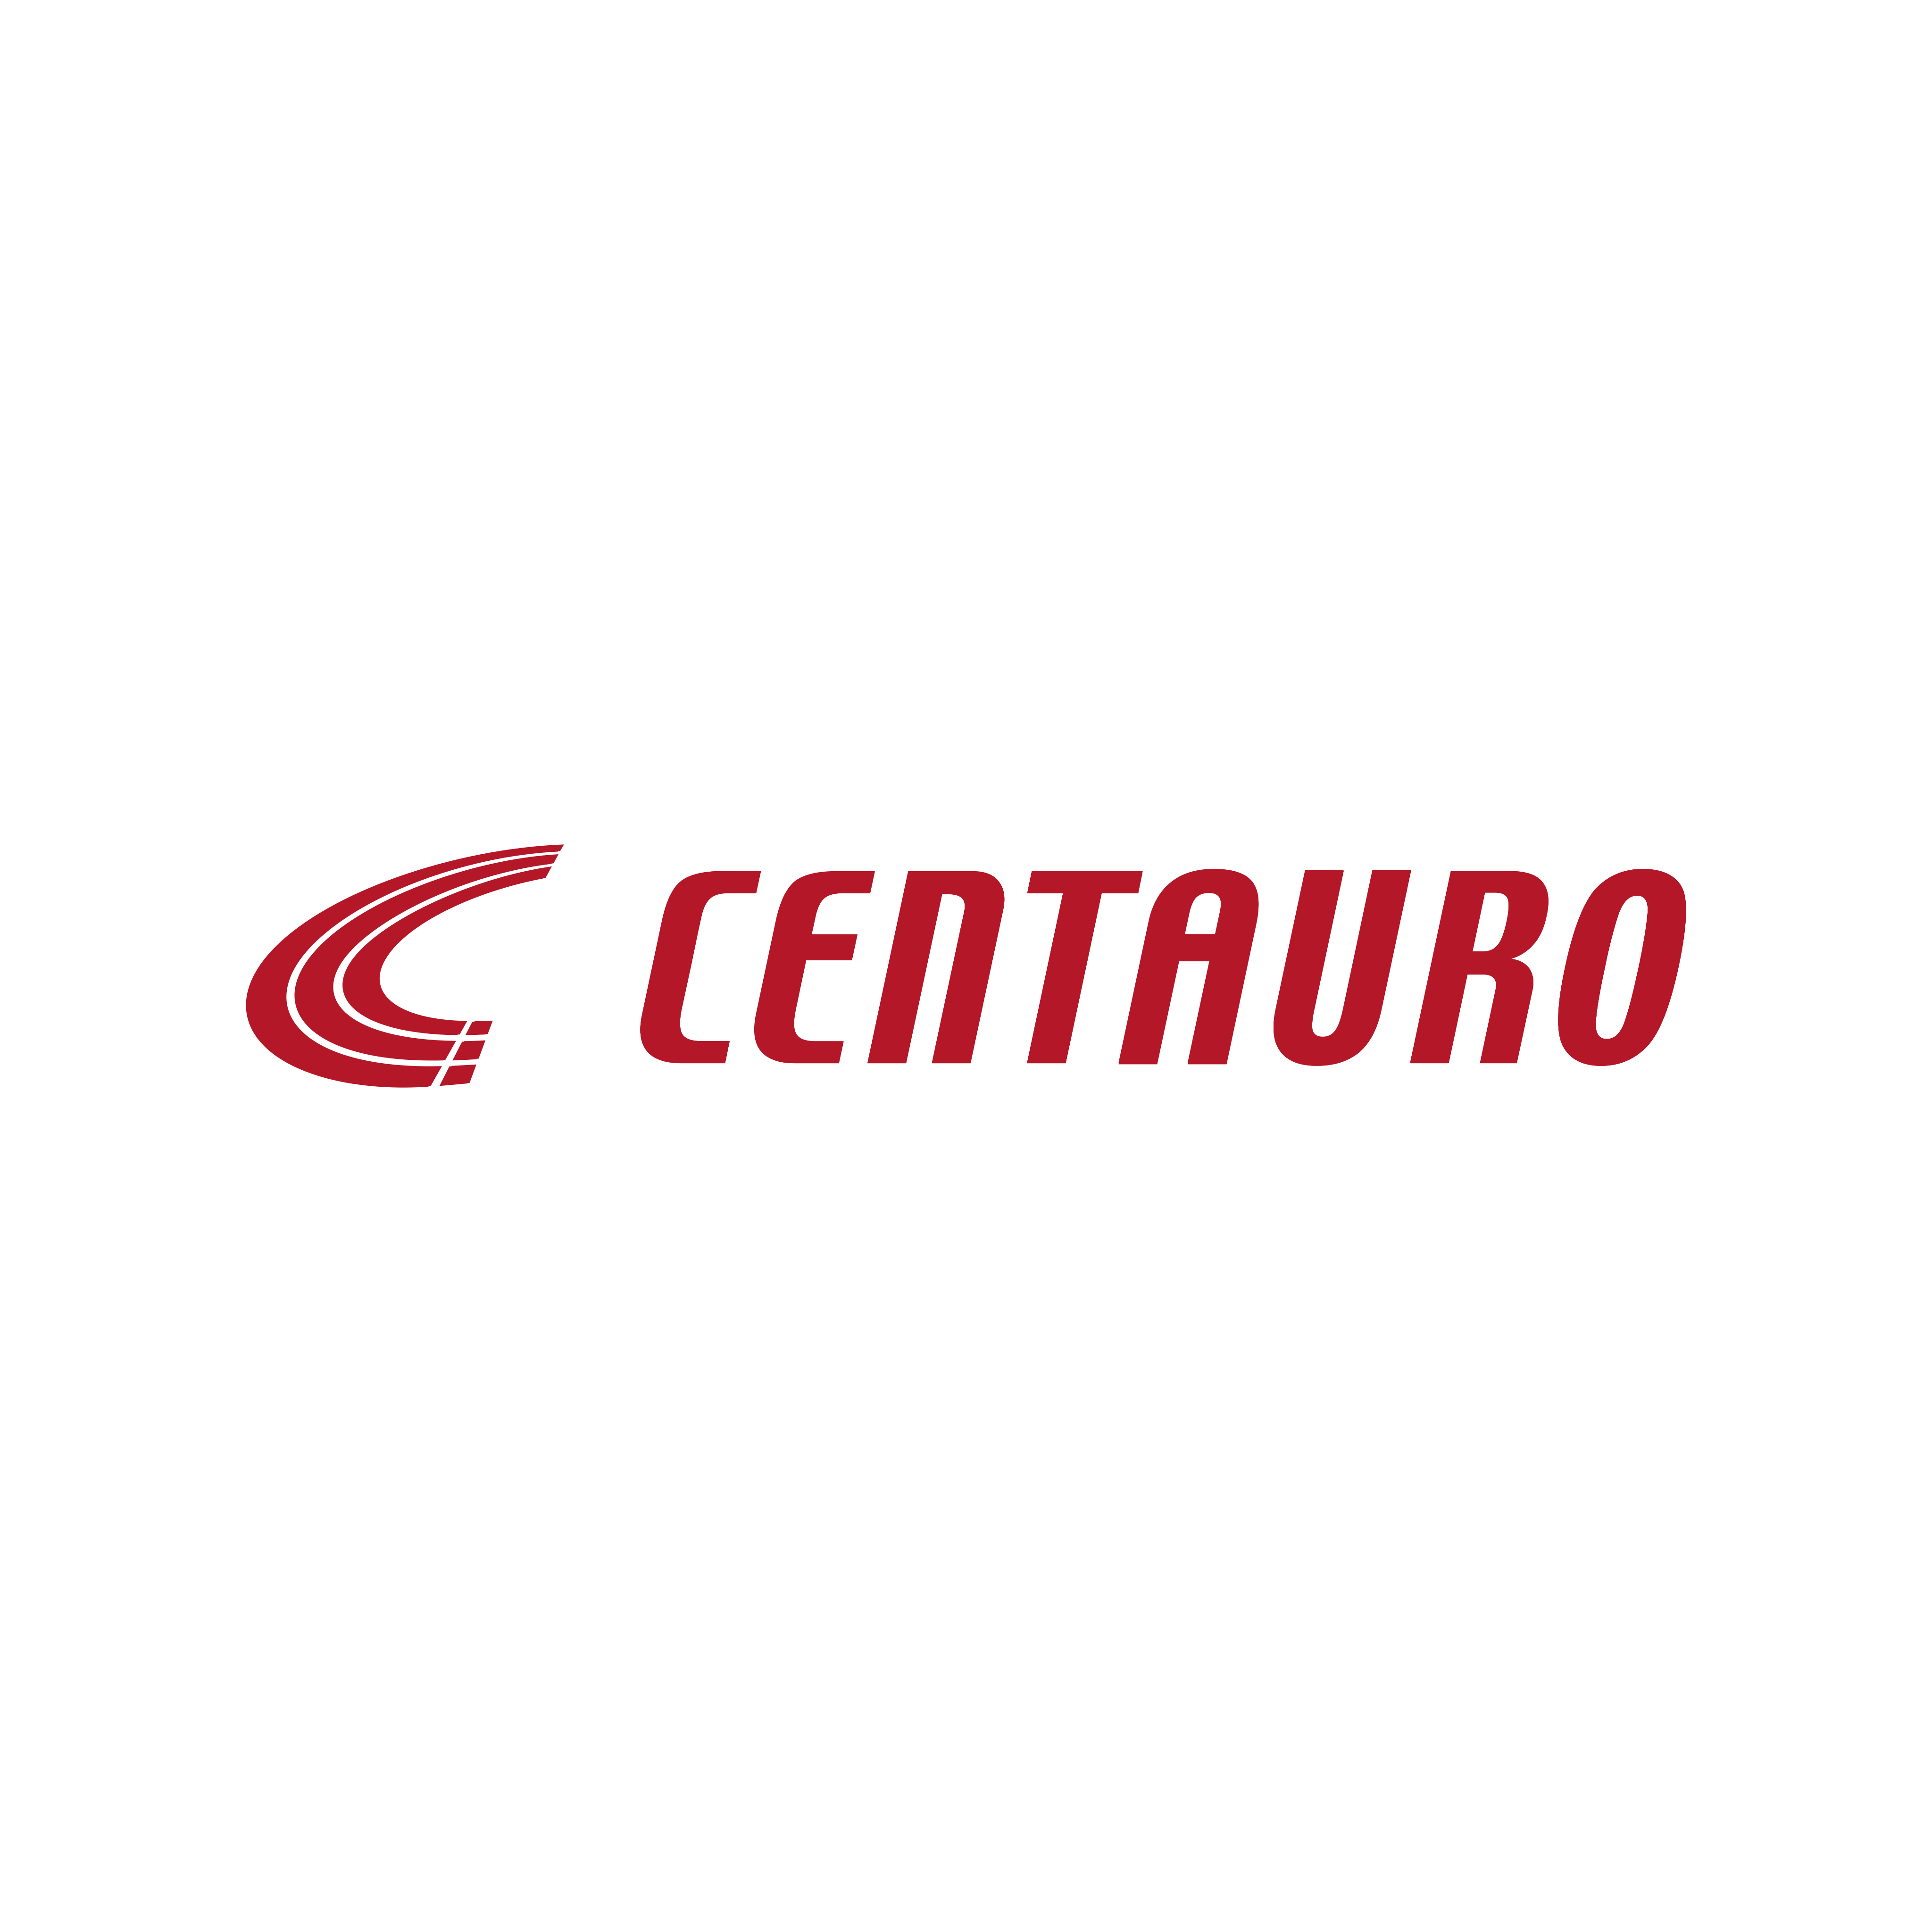 centauro logo 00 - Centauro Logo